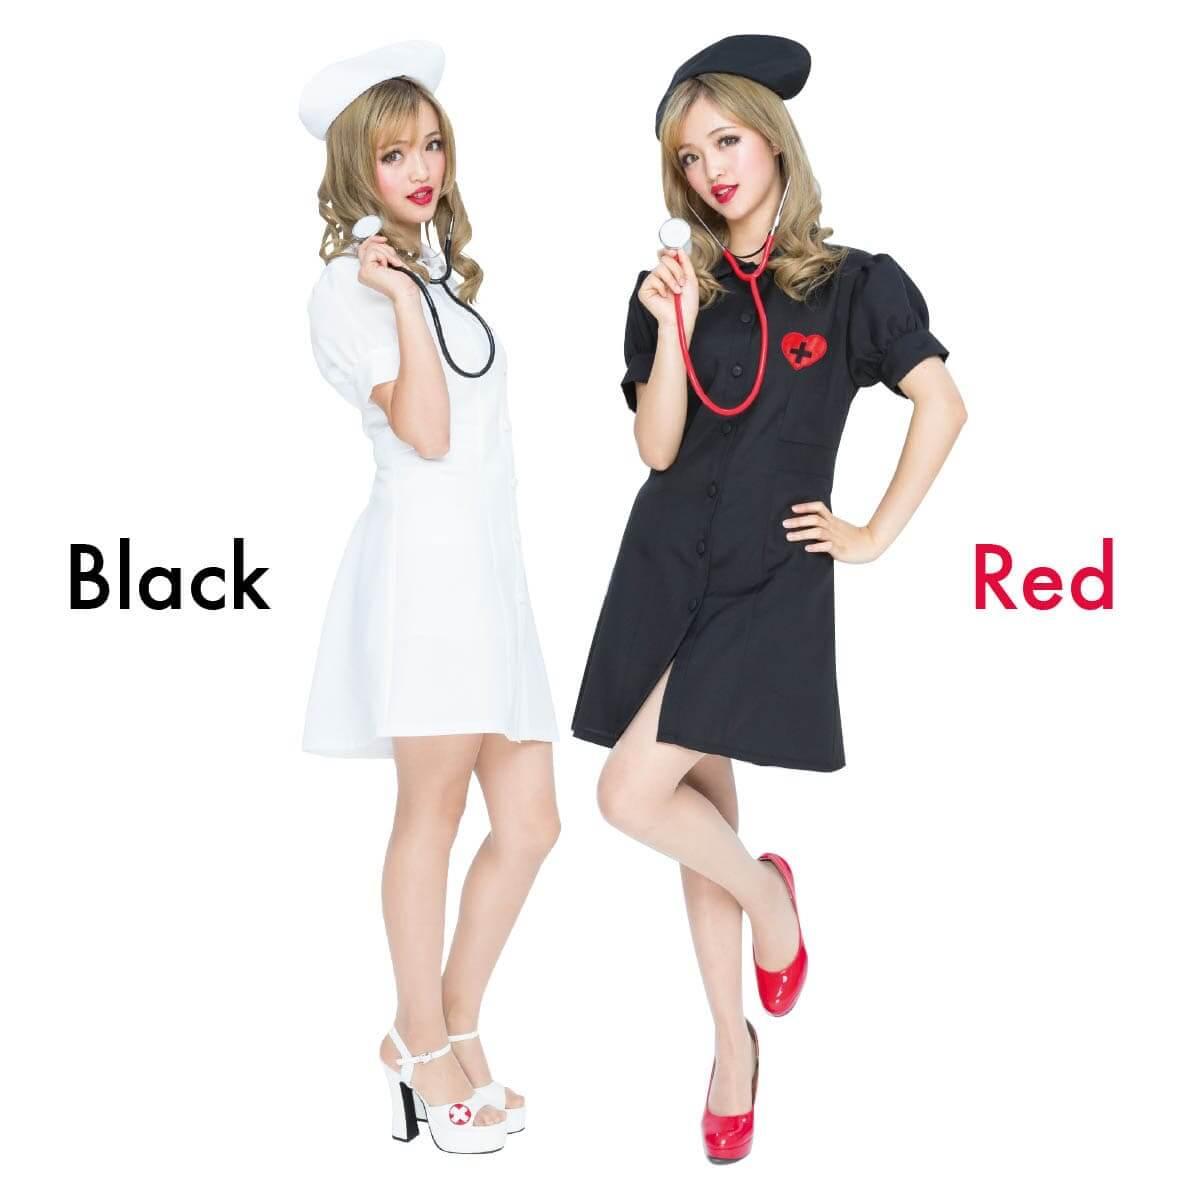 PUREネット通販で購入可能な聴診器の小物付きの白い白衣と黒い白衣